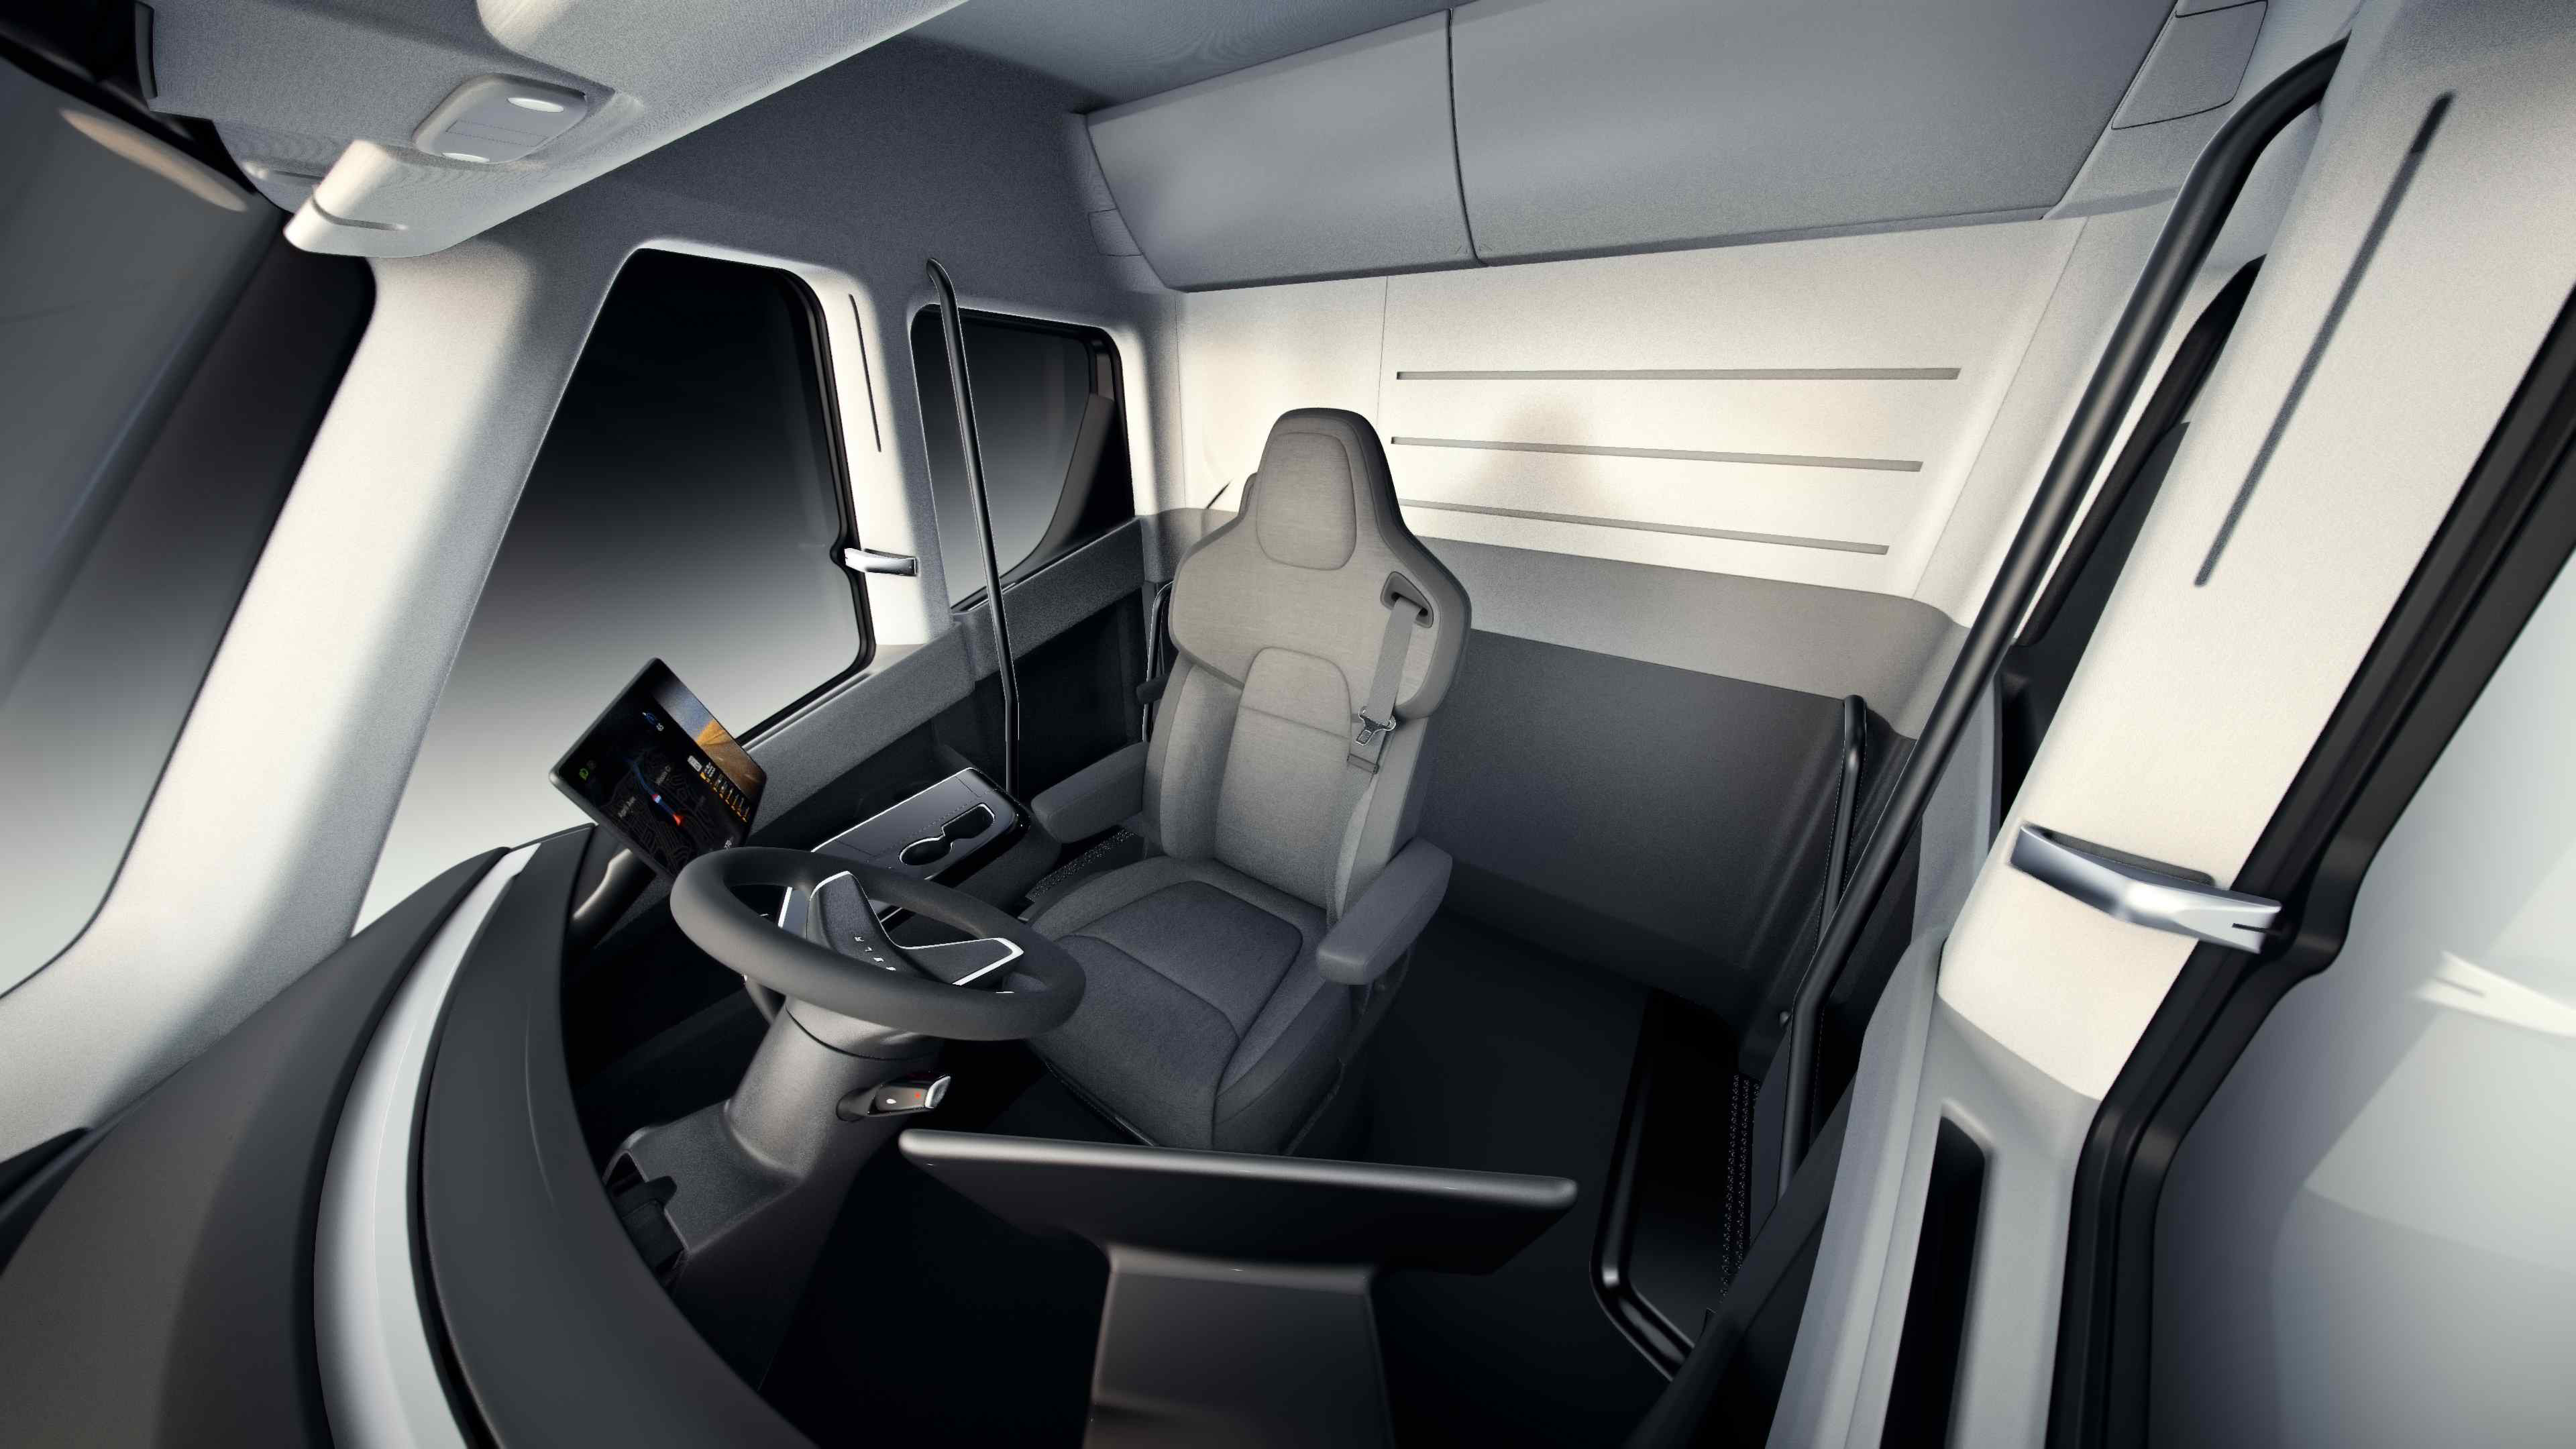 Interior of Tesla Semi-Truck